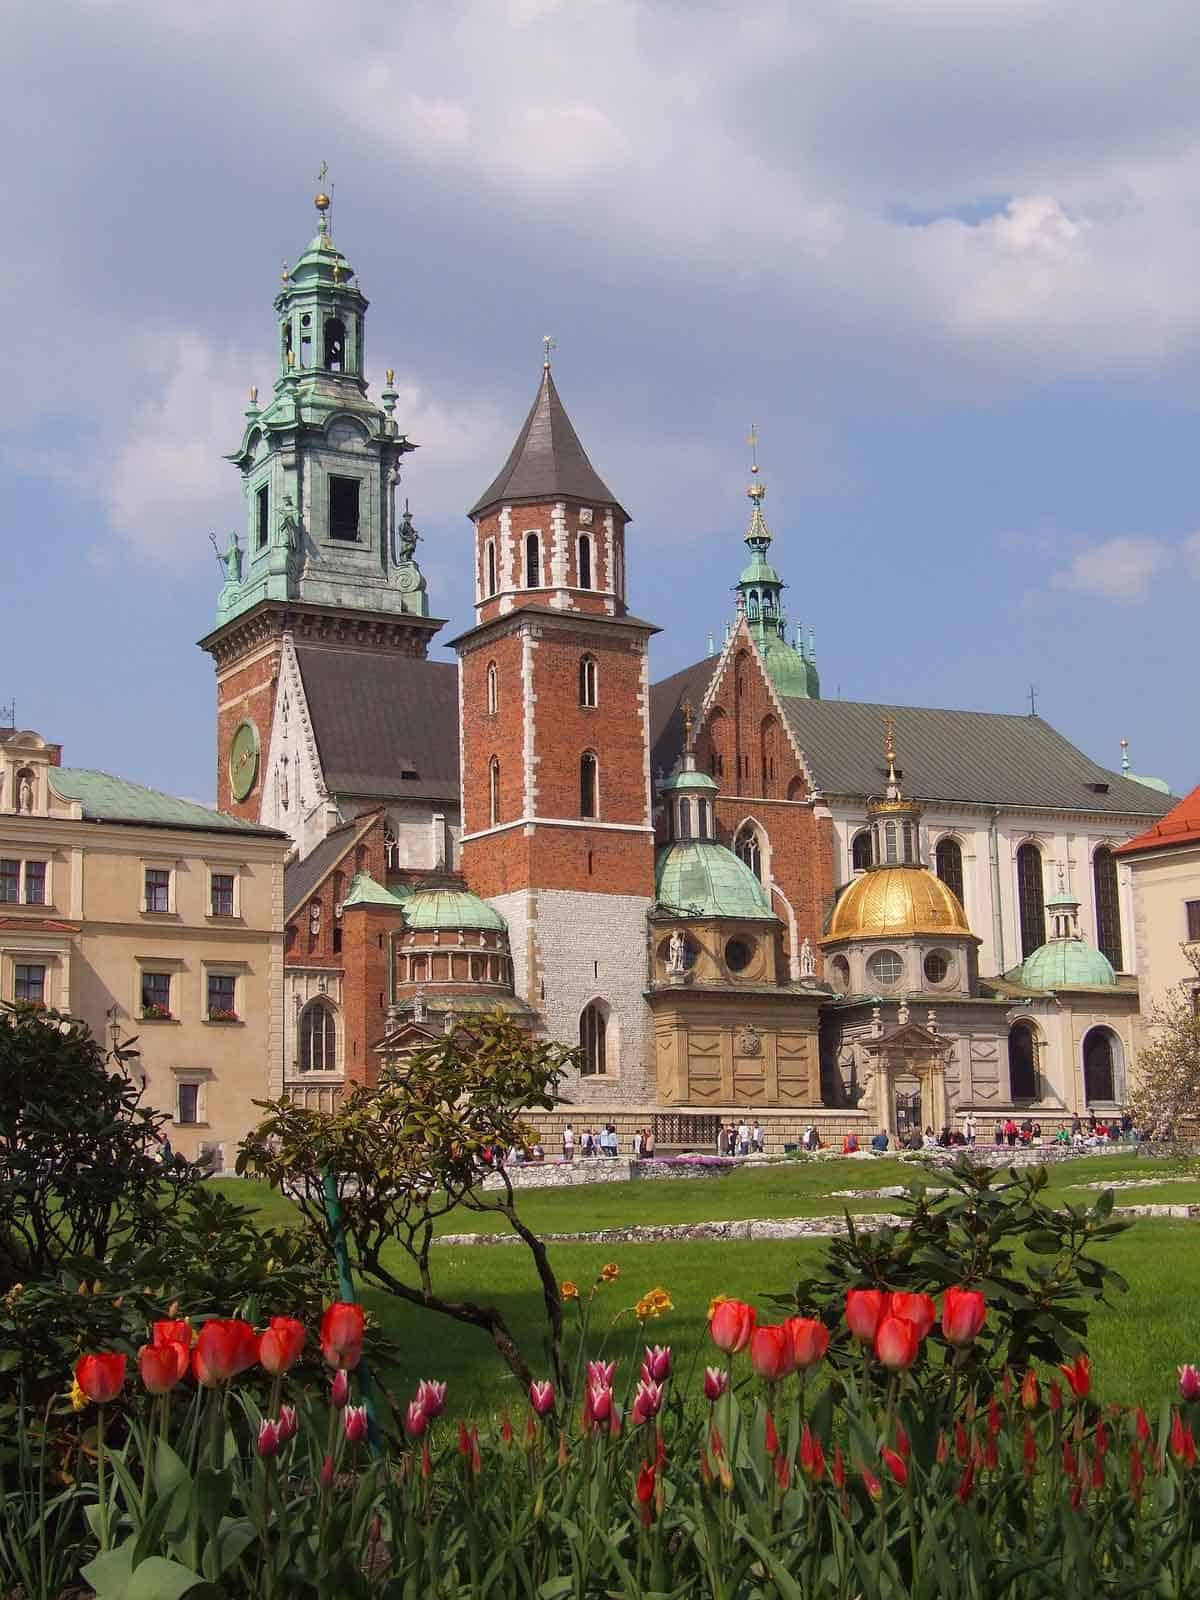 unesco world heritage sites in europe krakow historic center poland